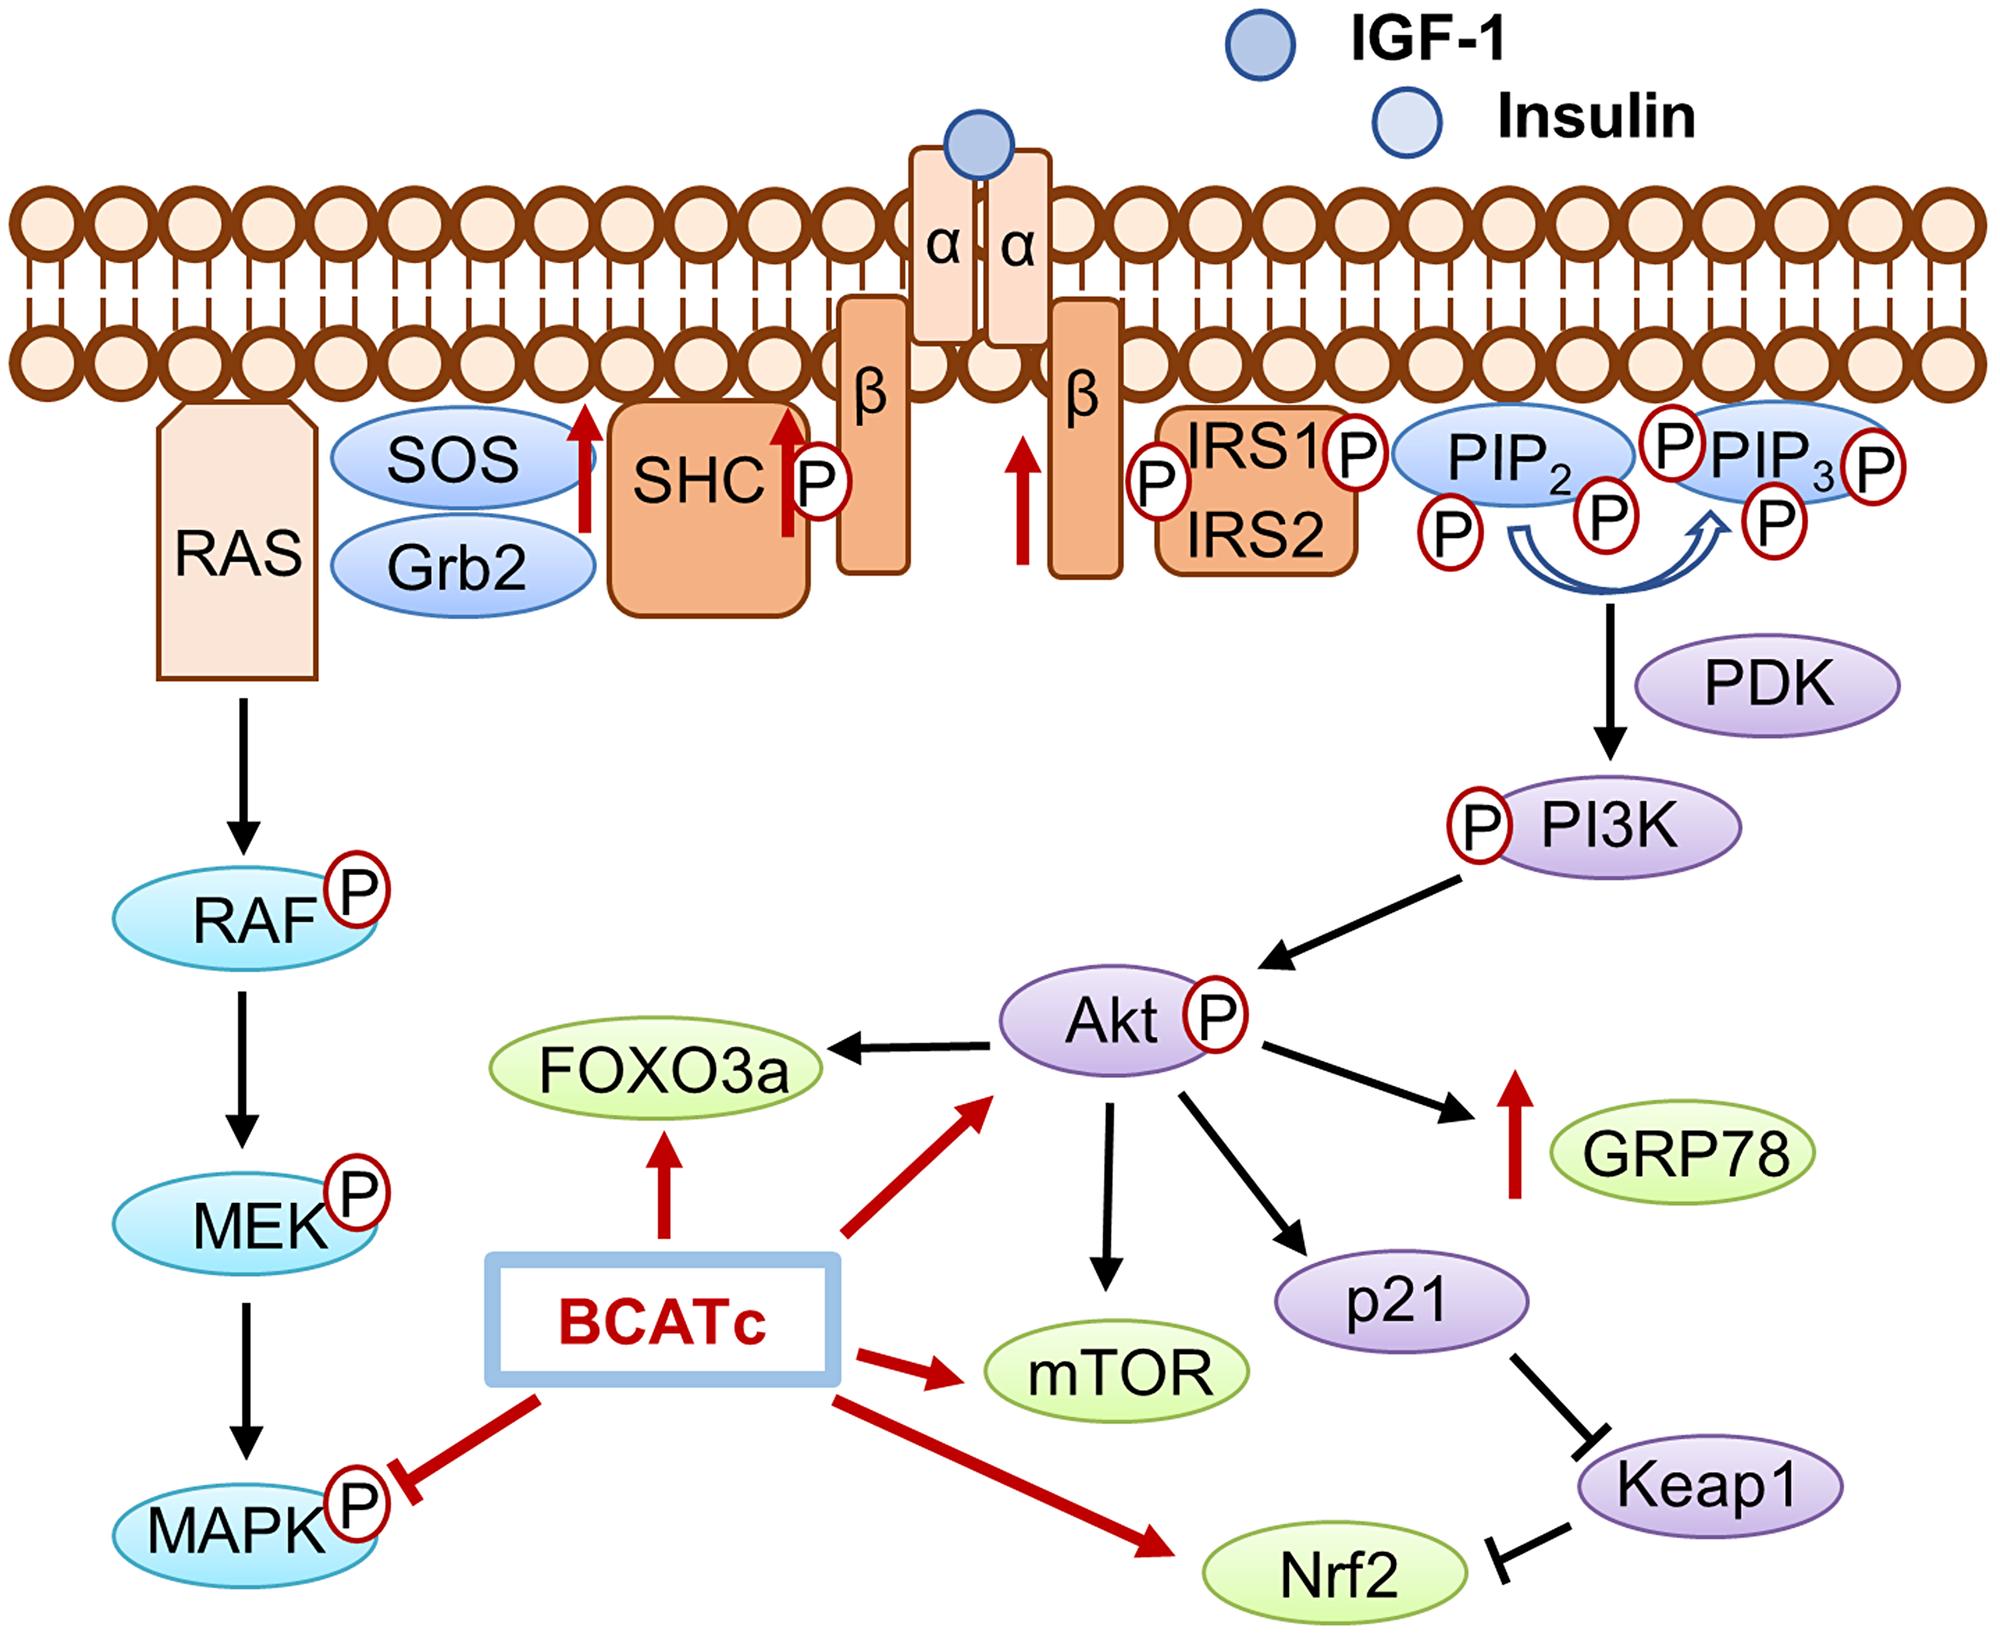 The role of BCATc on the insulin/IGF-1 signalling cascades.